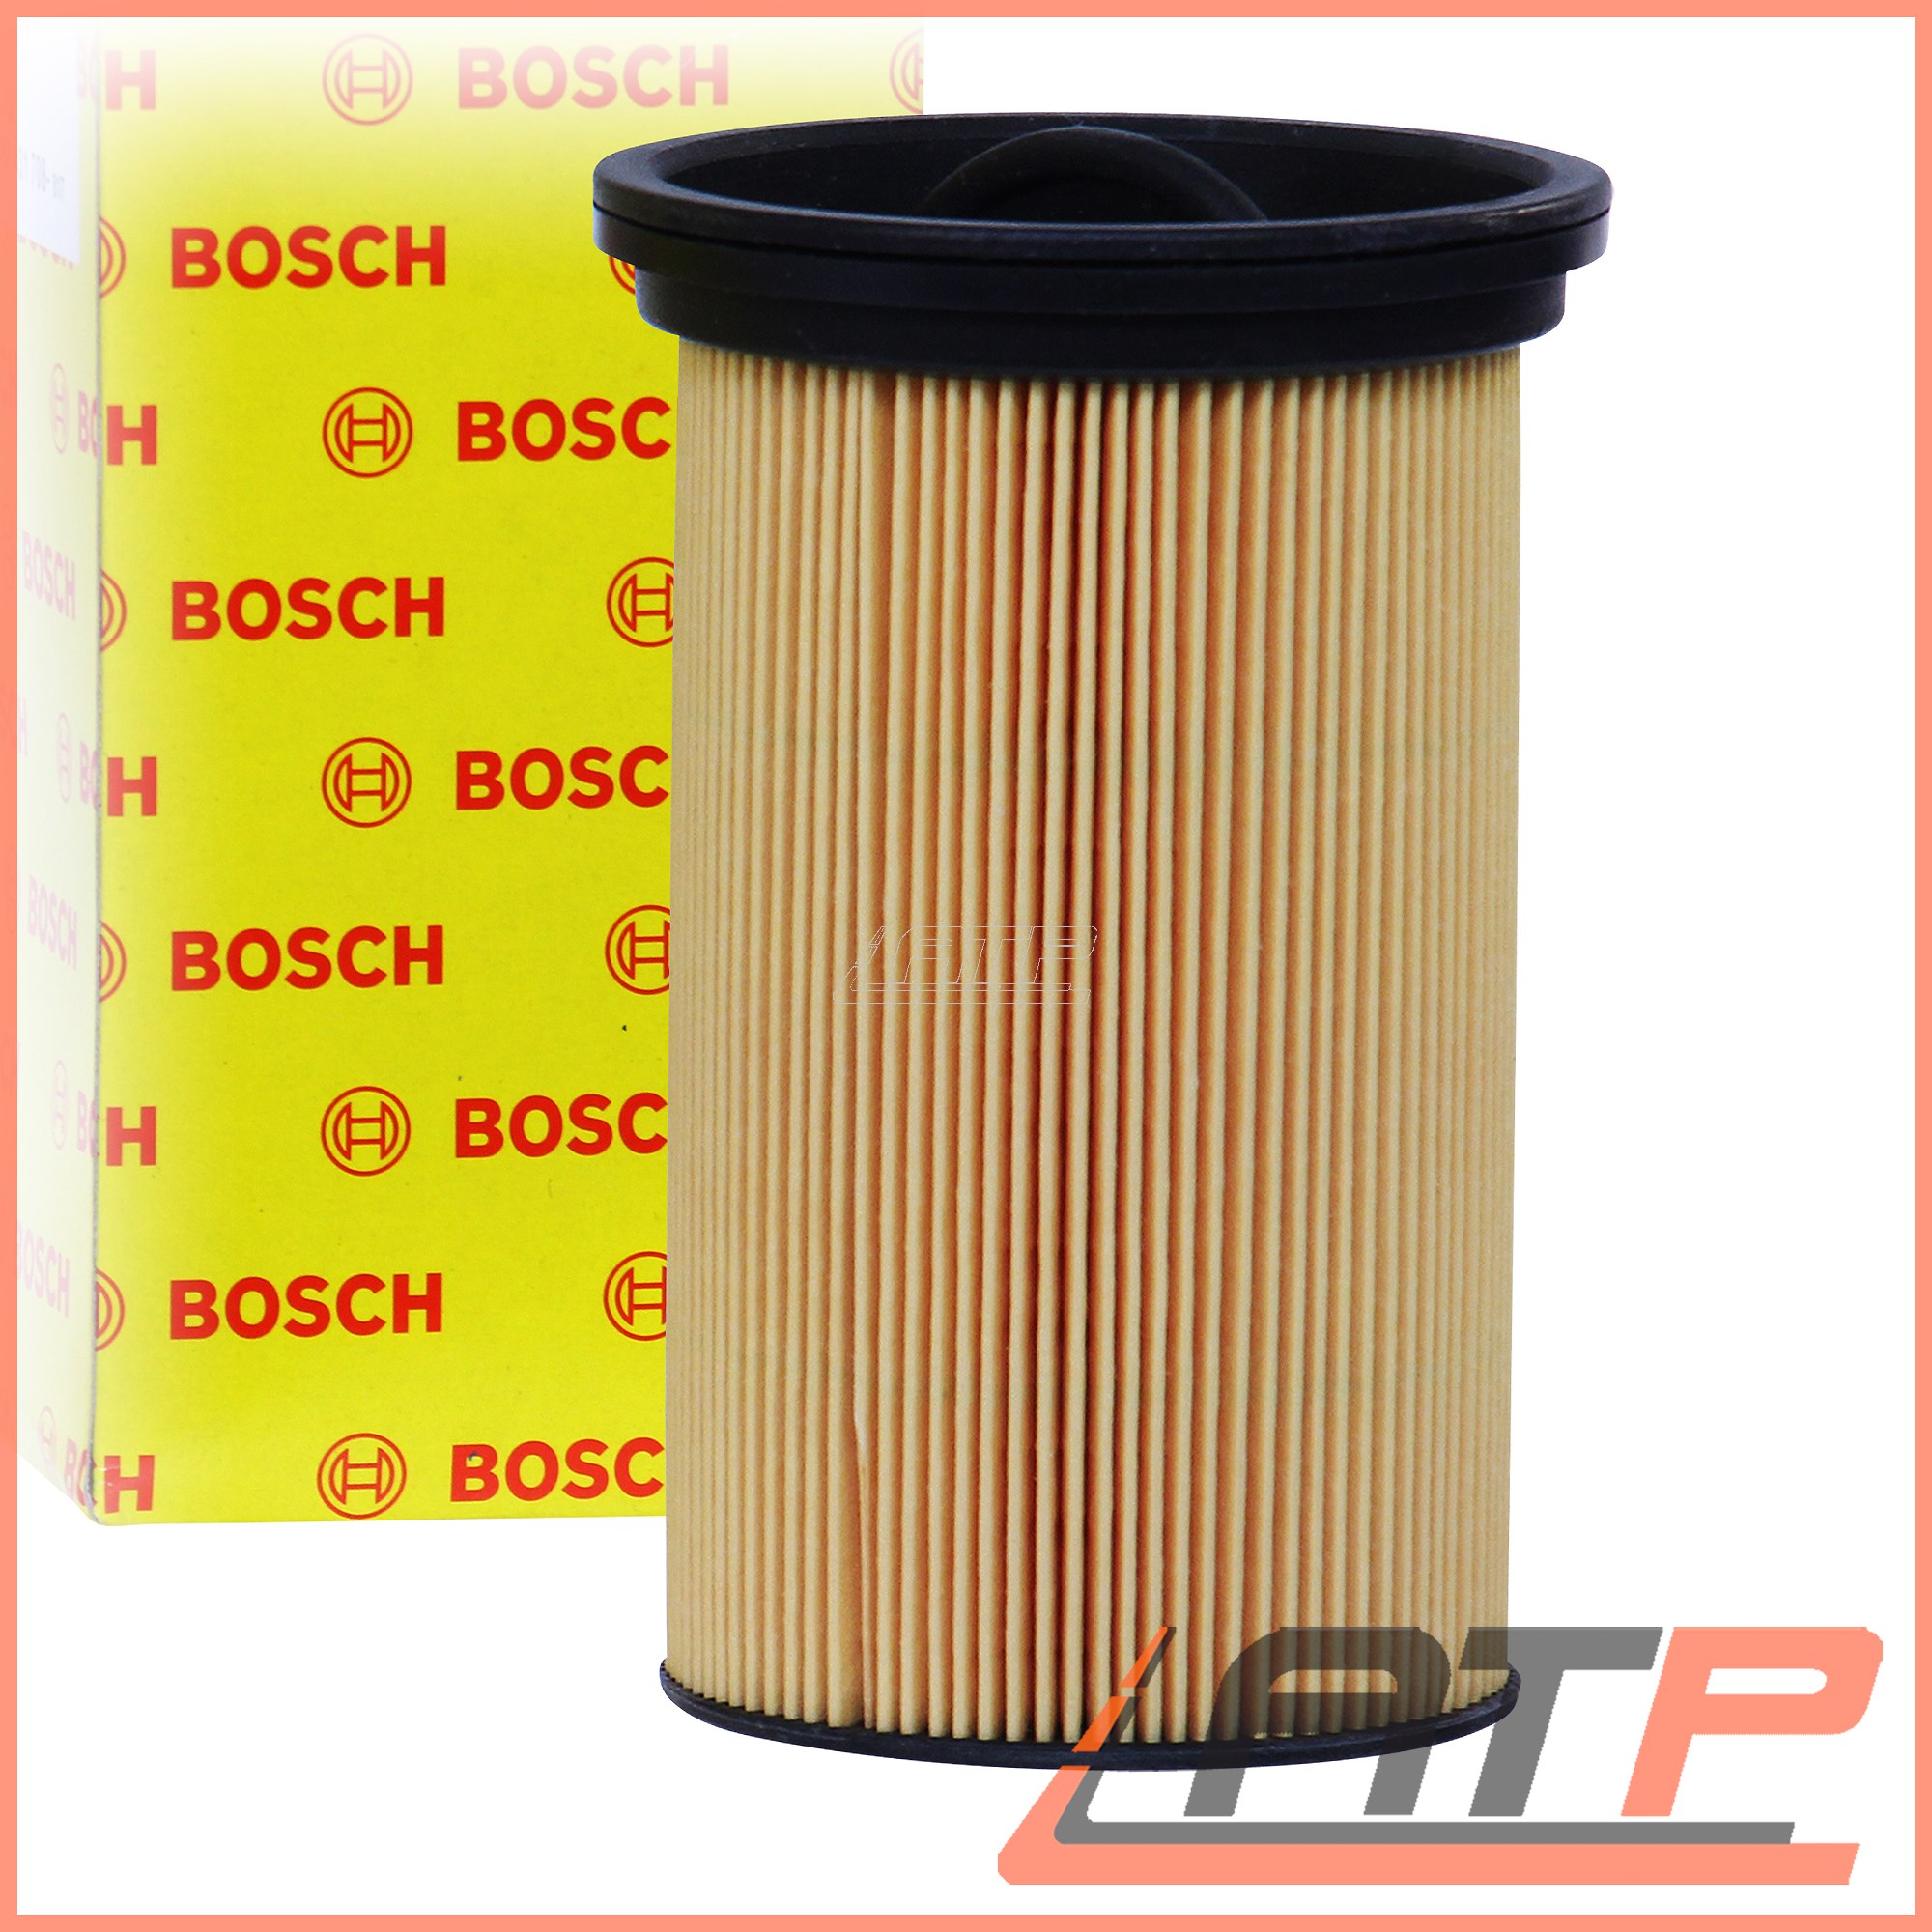 BOSCH-FILTER-SERVICE-KIT-5L-CASTROL-5W-30-C3-BMW-3-SERIES-E46-318-320-D-98-03 thumbnail 4